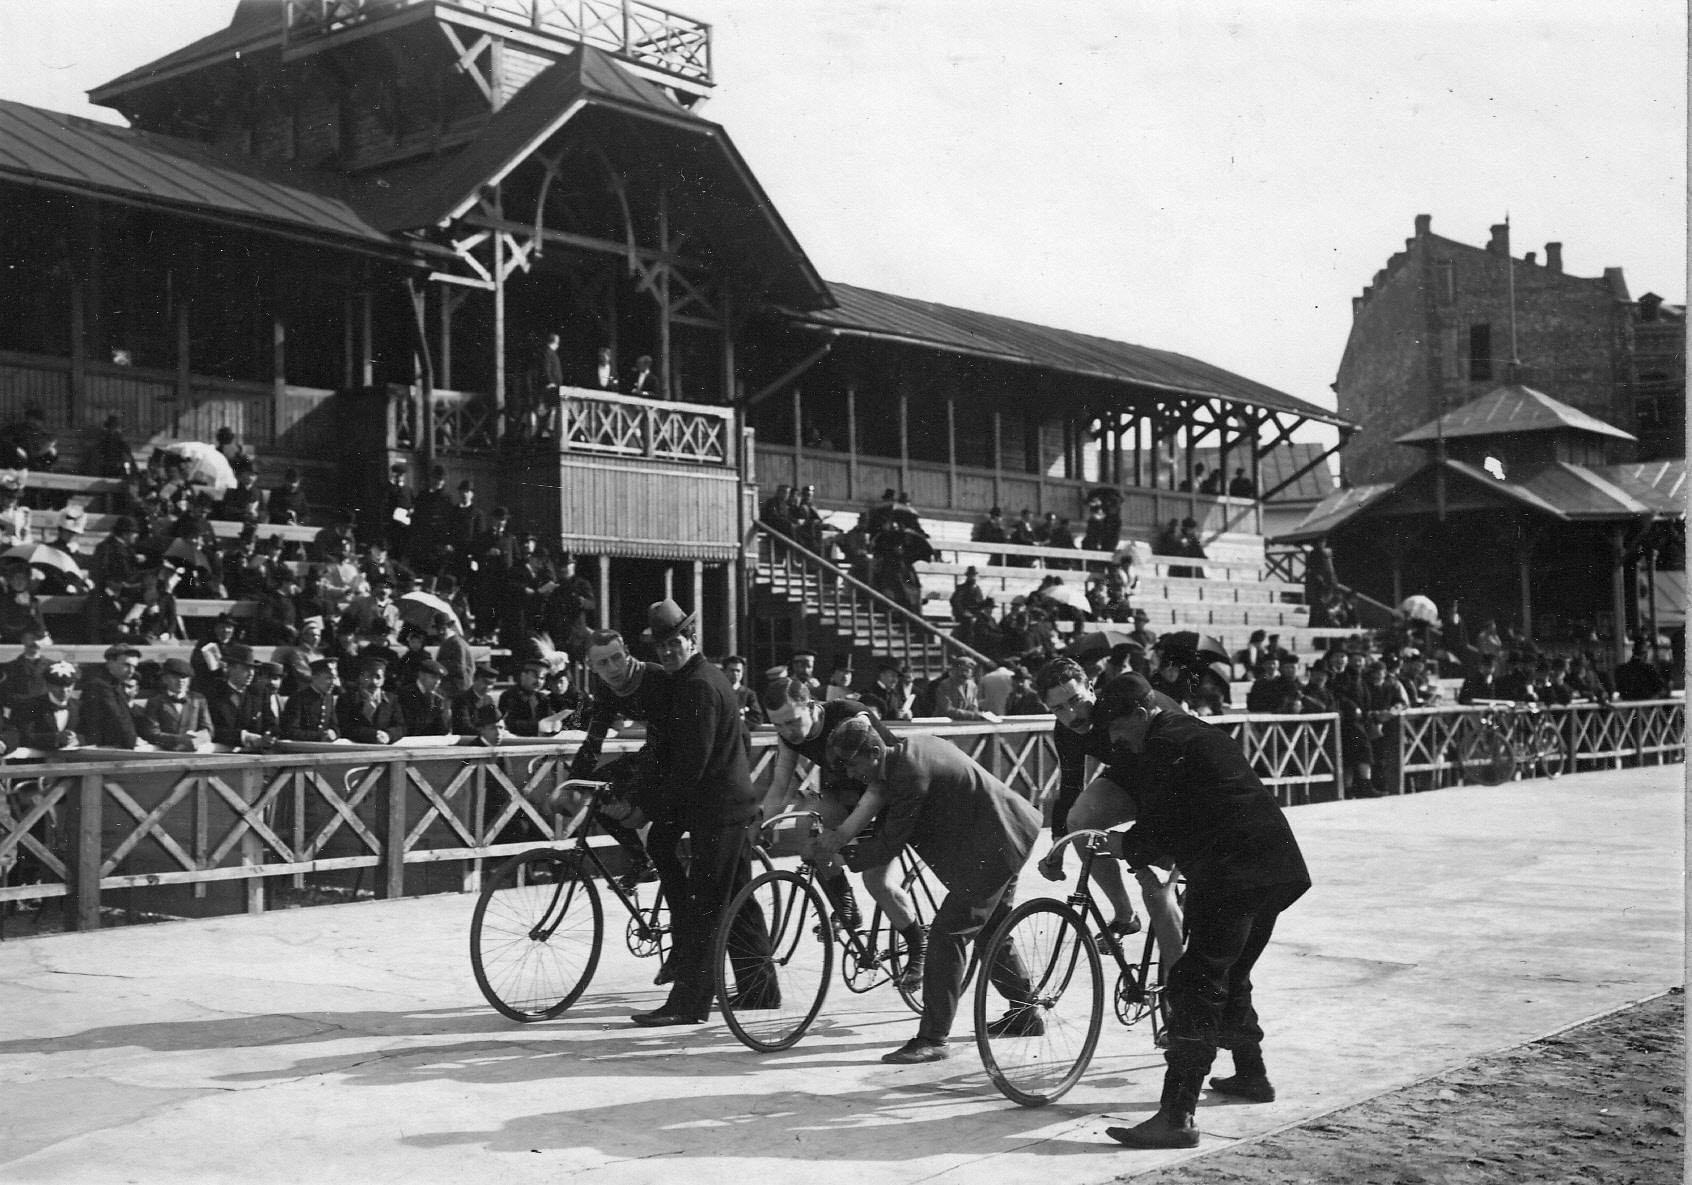 Гонщики на старте во время соревнований на велодроме